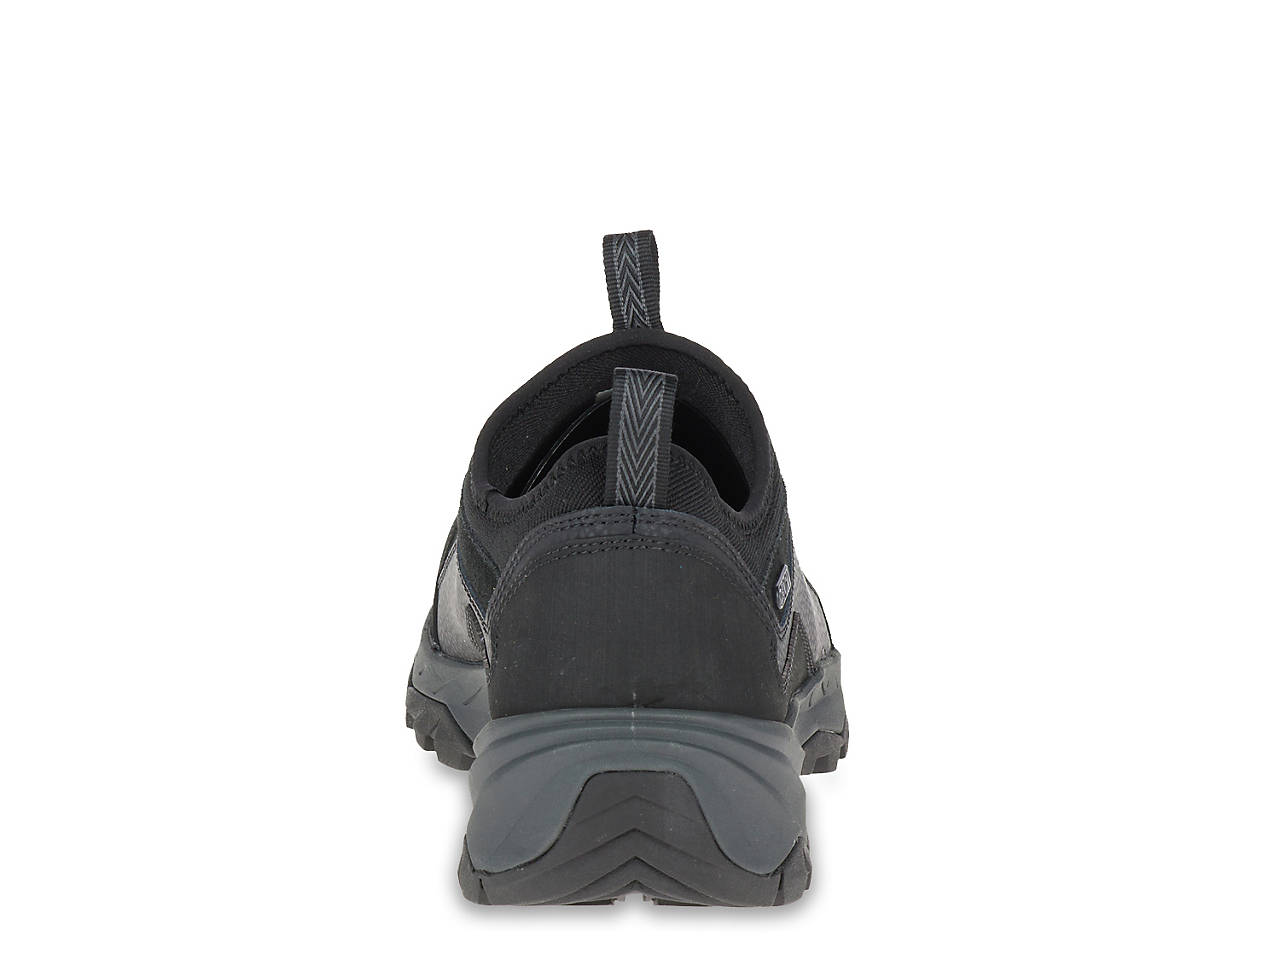 8673a052f8 Icepack Polar Slip-On Trail Shoe